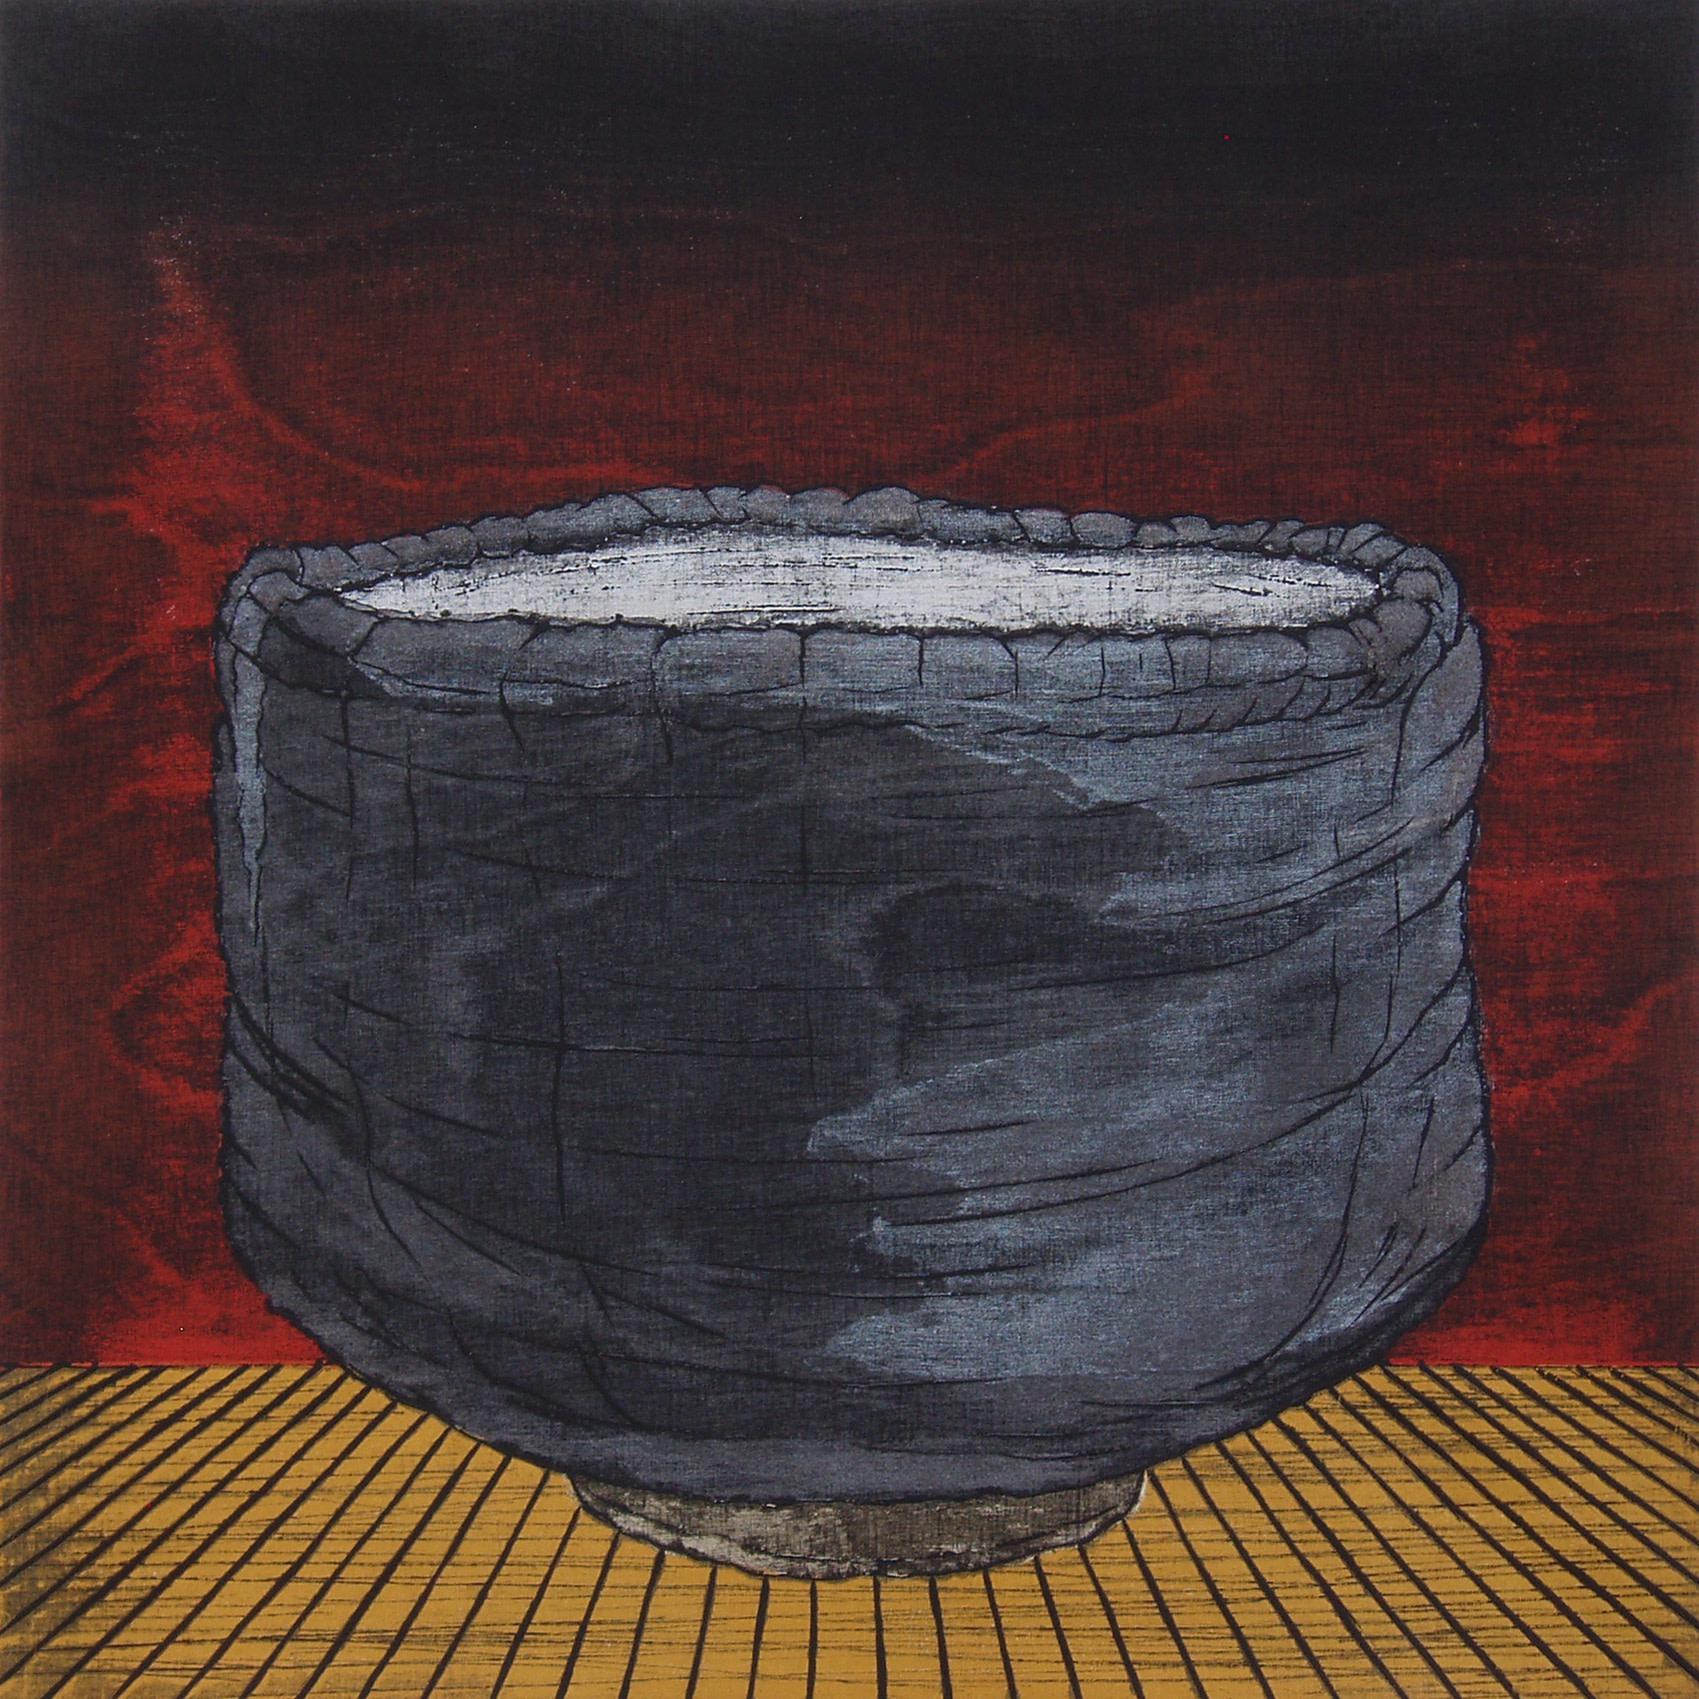 "<span class=""link fancybox-details-link""><a href=""/exhibitions/21/works/artworks_standalone10891/"">View Detail Page</a></span><div class=""artist""><span class=""artist""><strong>Nana Shiomi RE</strong></span></div><div class=""title""><em>Tea Bowl Universe</em></div><div class=""medium"">woodcut</div><div class=""dimensions"">45 x 45cm framed<br>30 x 30cm unframed</div><div class=""edition_details"">AP4</div>"